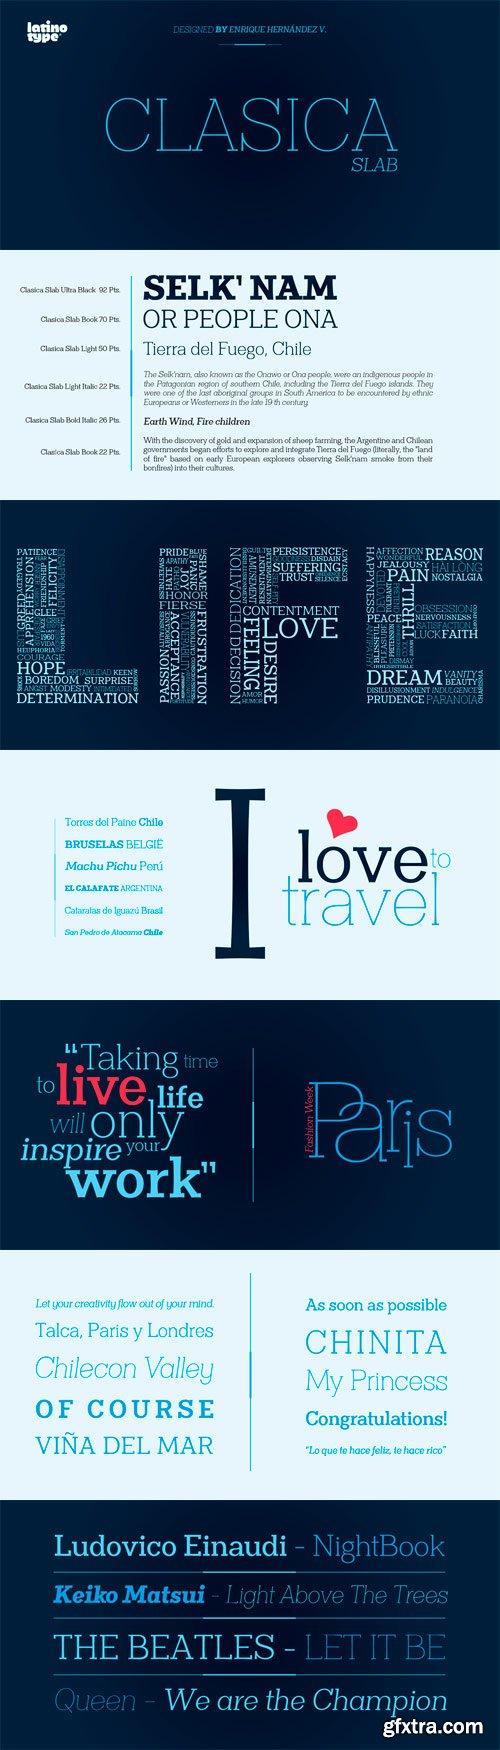 Clasica Slab Font Family - 18 Fonts for $136